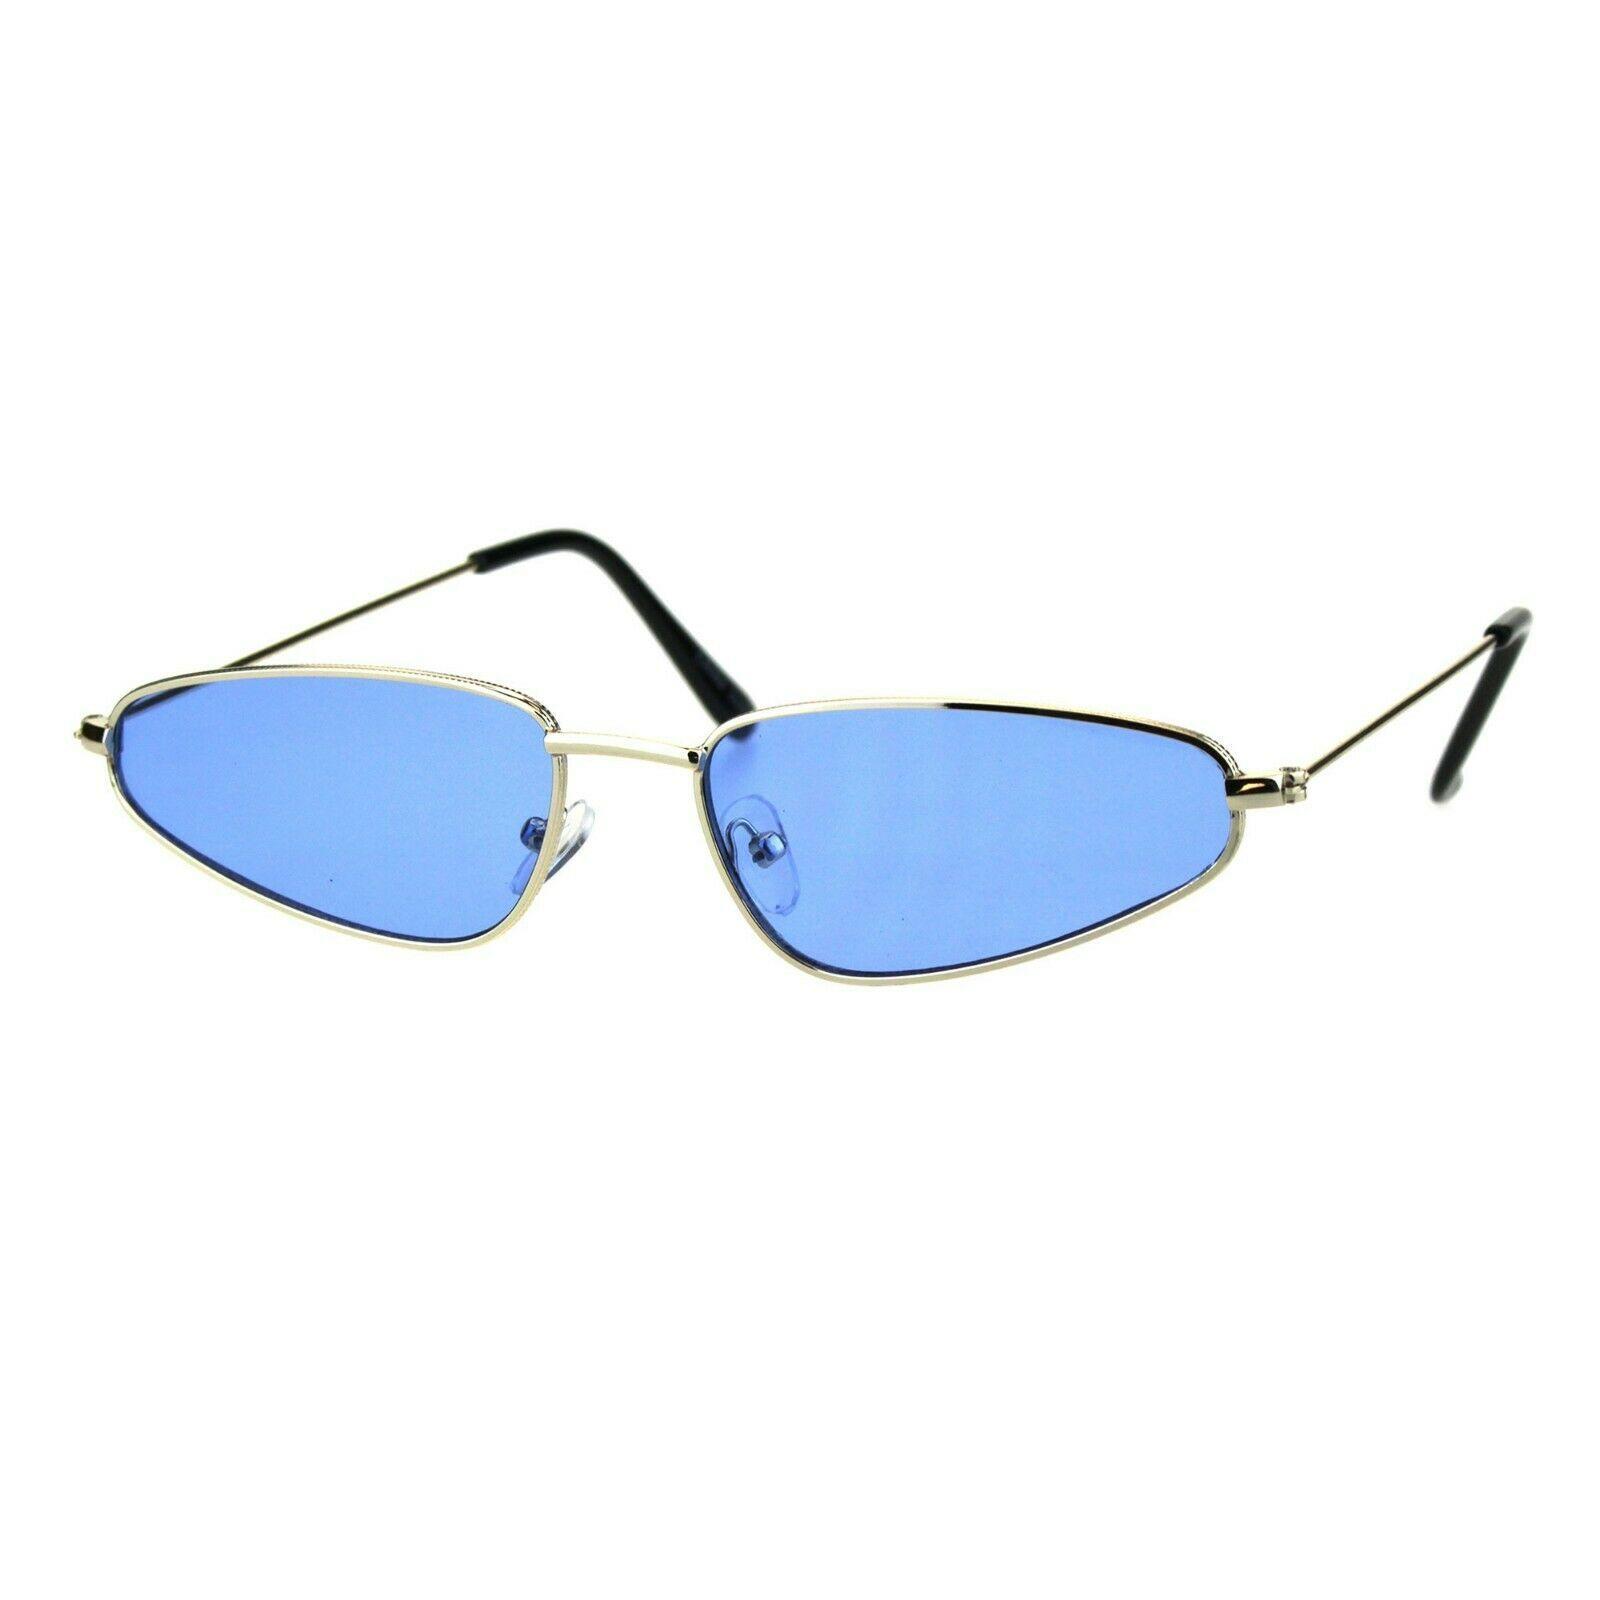 Womens Fashion Sunglasses Skinny Small Gold Metal Frame Color Lens